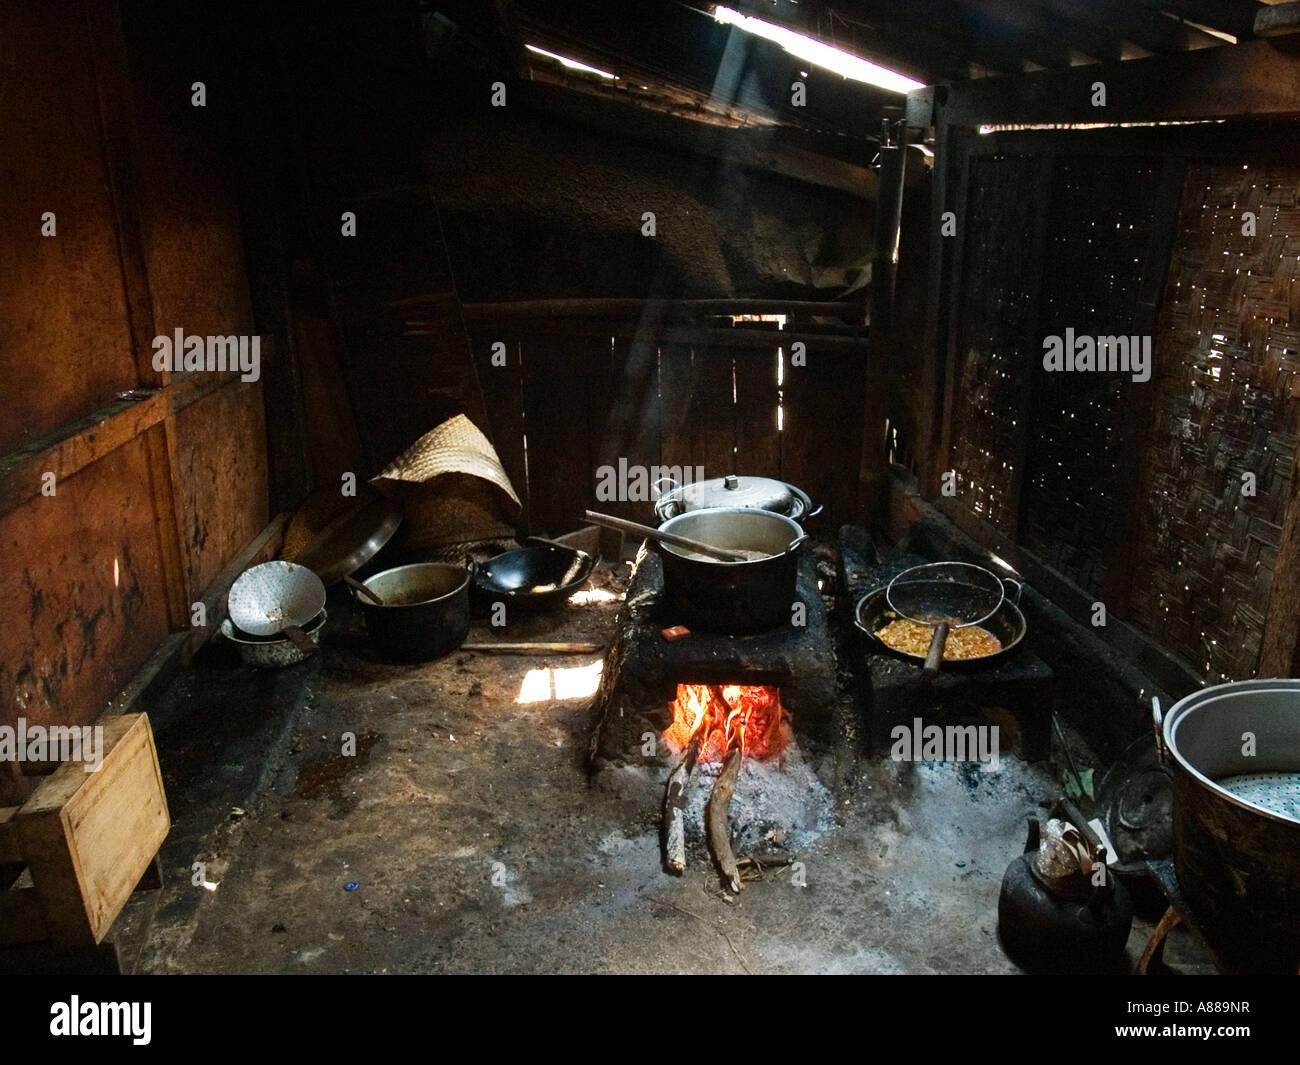 Flames leap around blackened cooking pot in dimly lit rural kitchen,near Madiun,Java,Indonesia - Stock Image